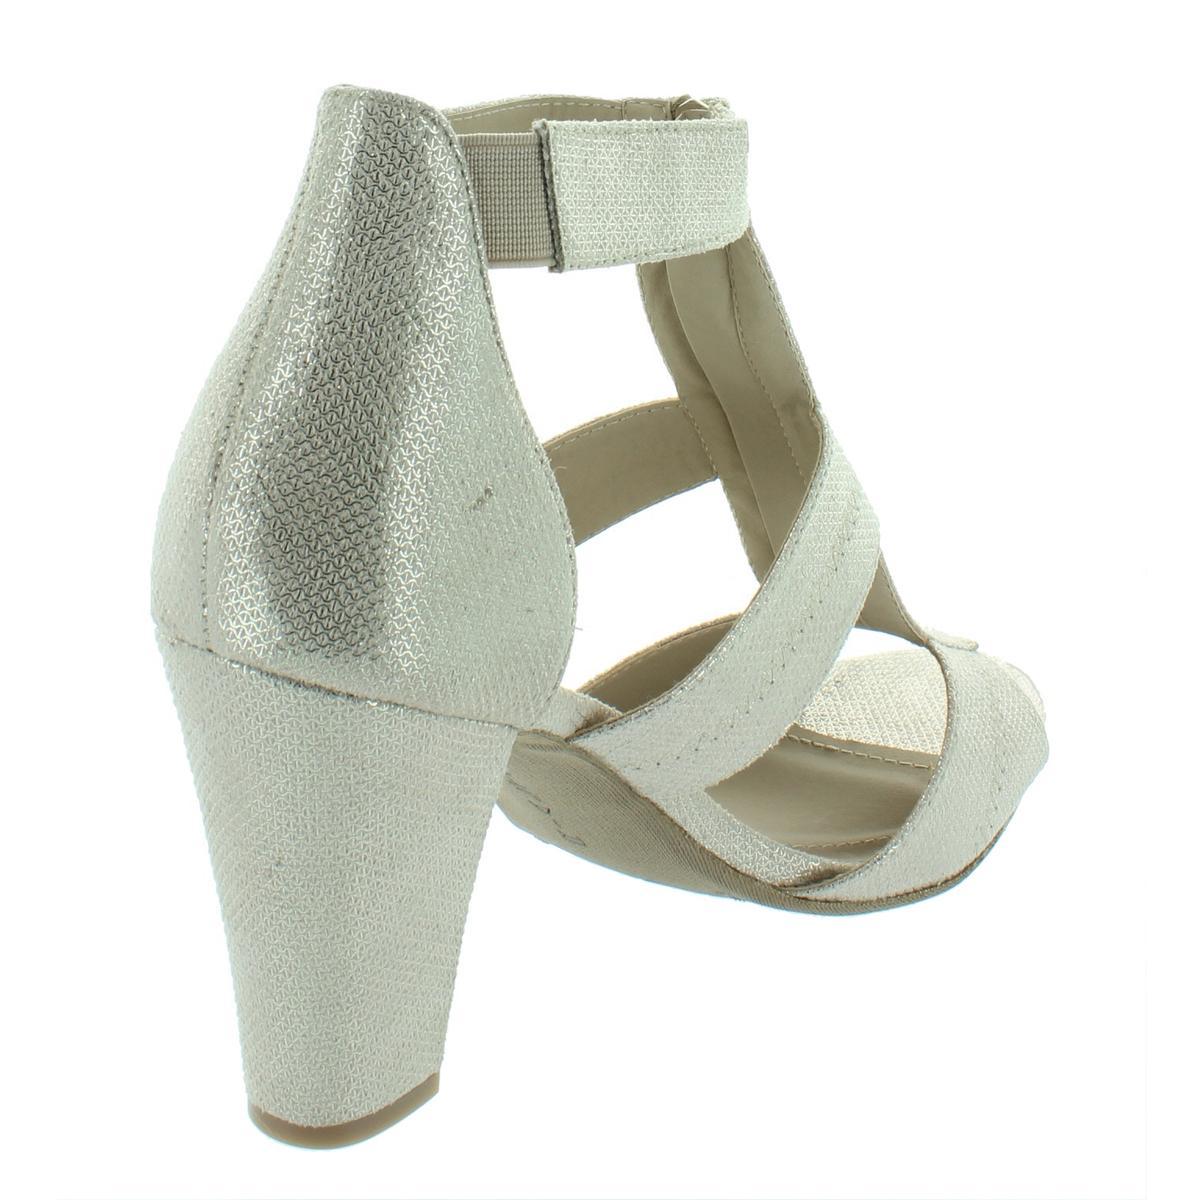 Rialto-Womens-Ritz-Open-Toe-Block-Heels-Evening-BHFO-8083 thumbnail 6